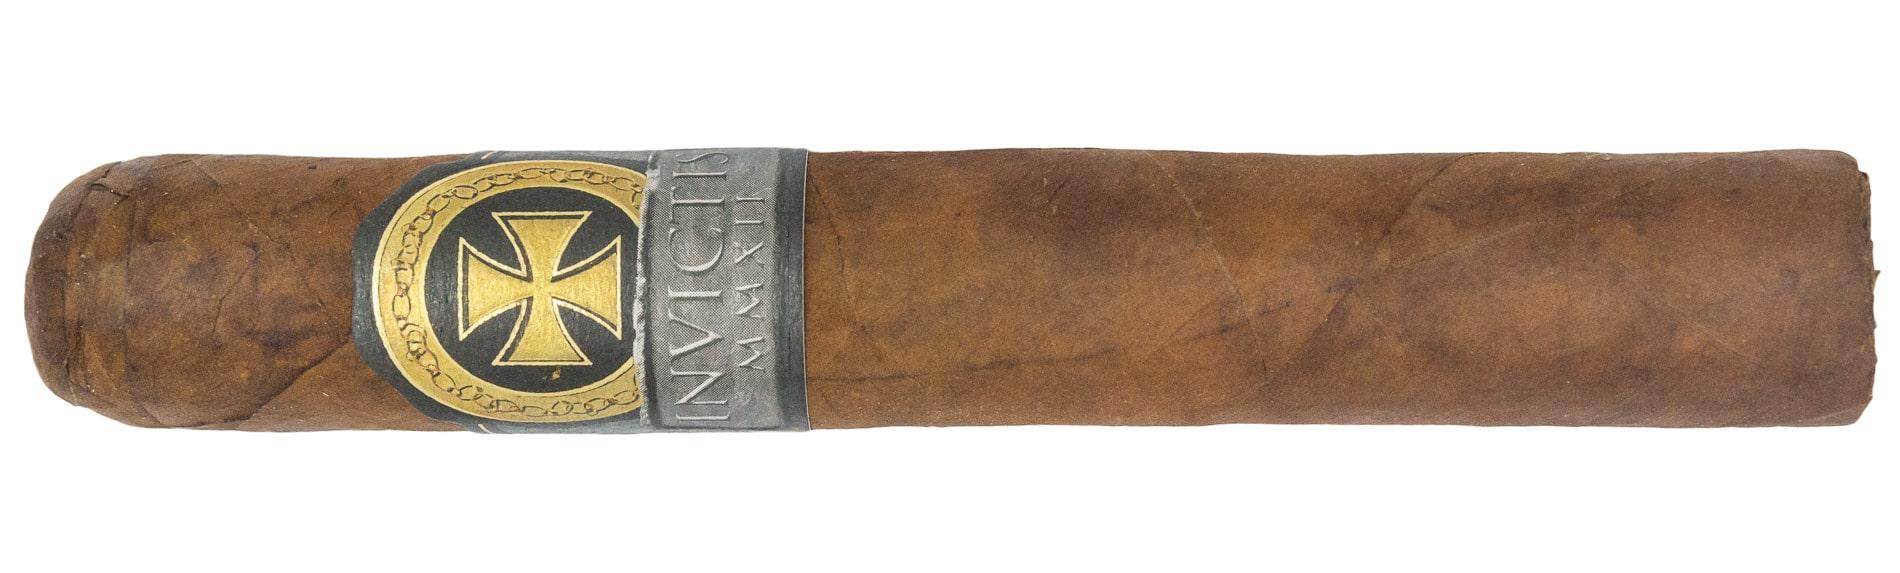 Blind Cigar Review: TRE J | Invictis Centurio